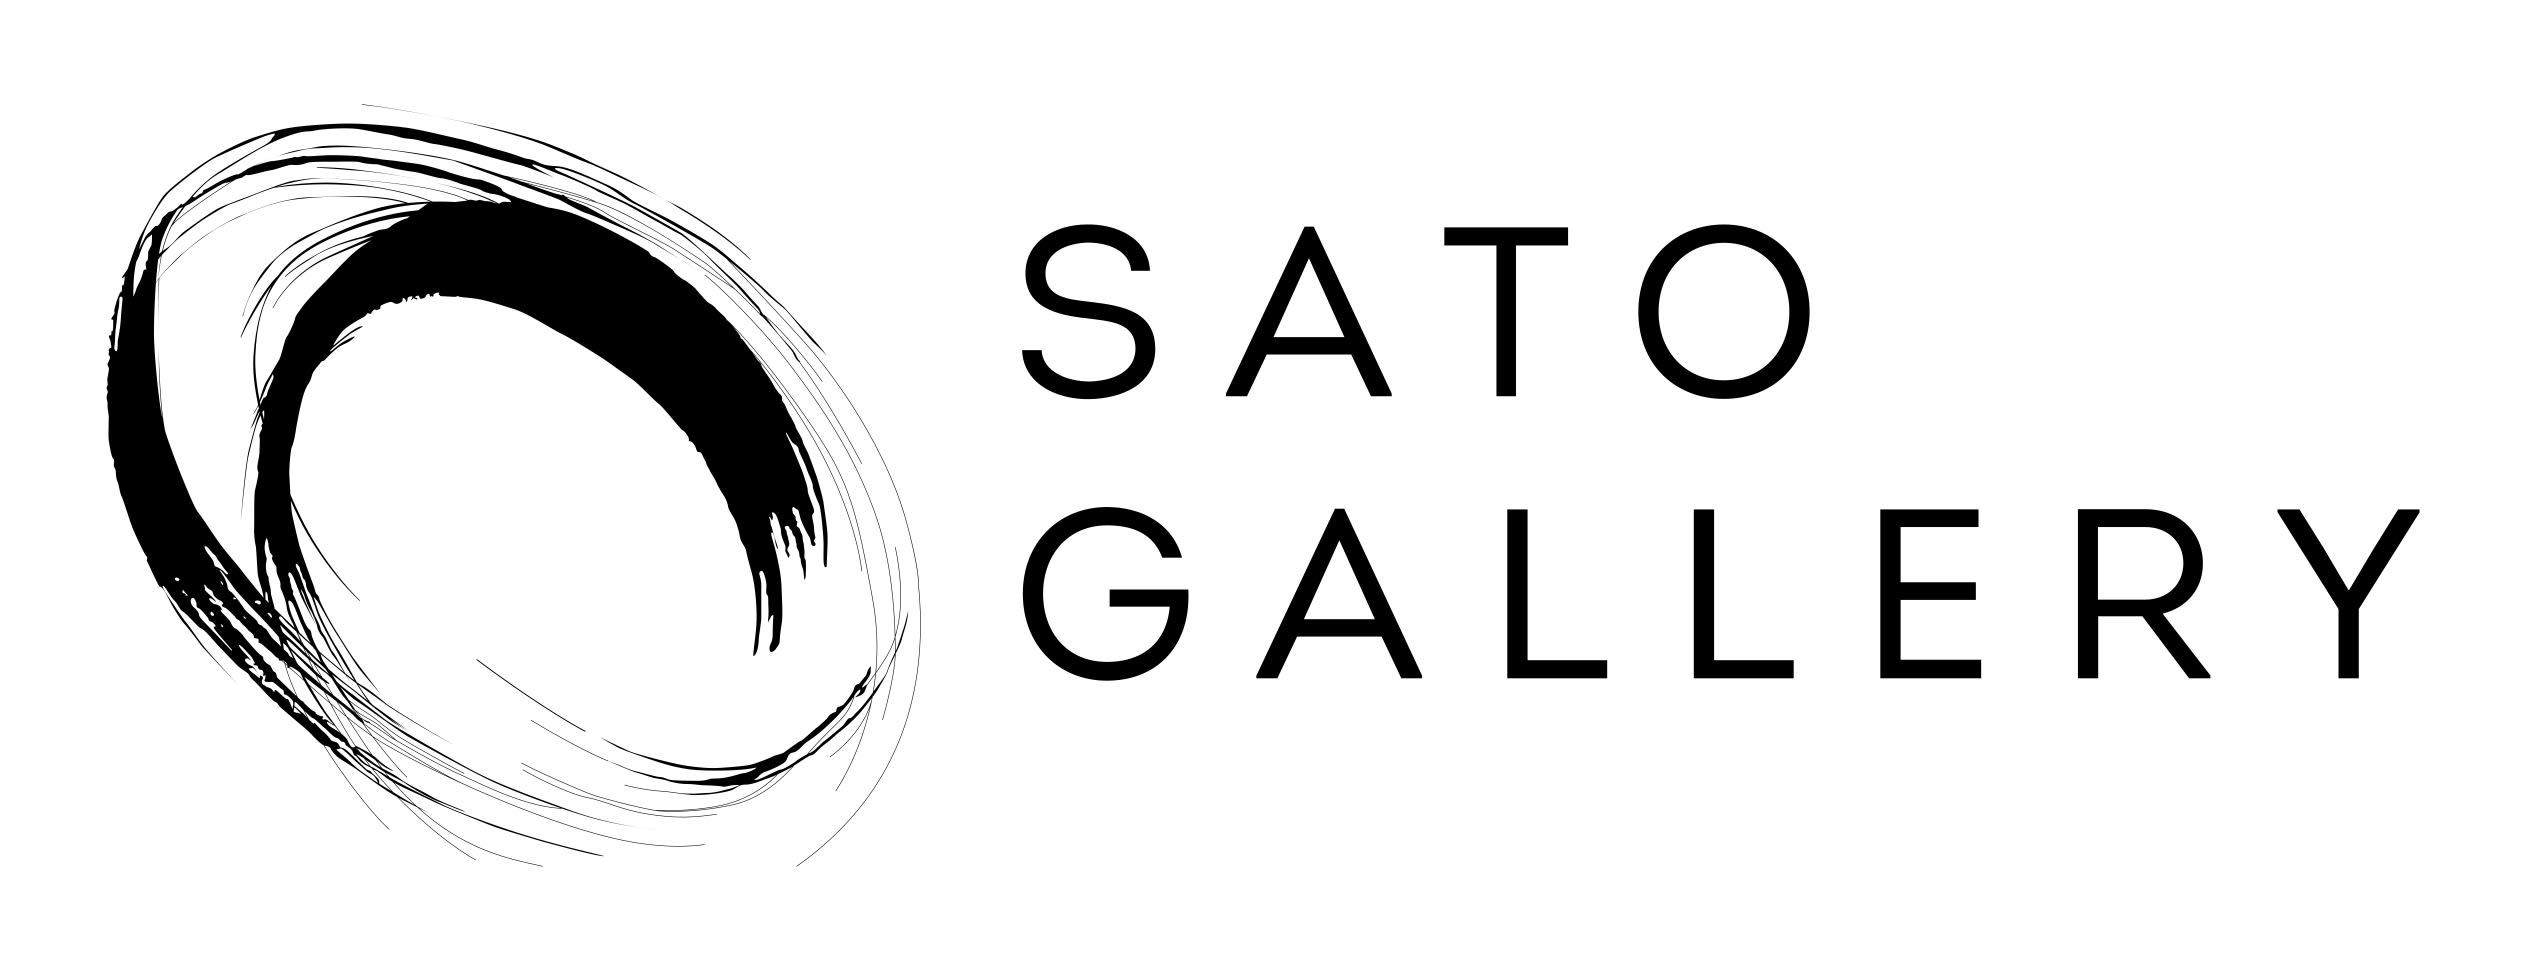 Sato Gallery company logo